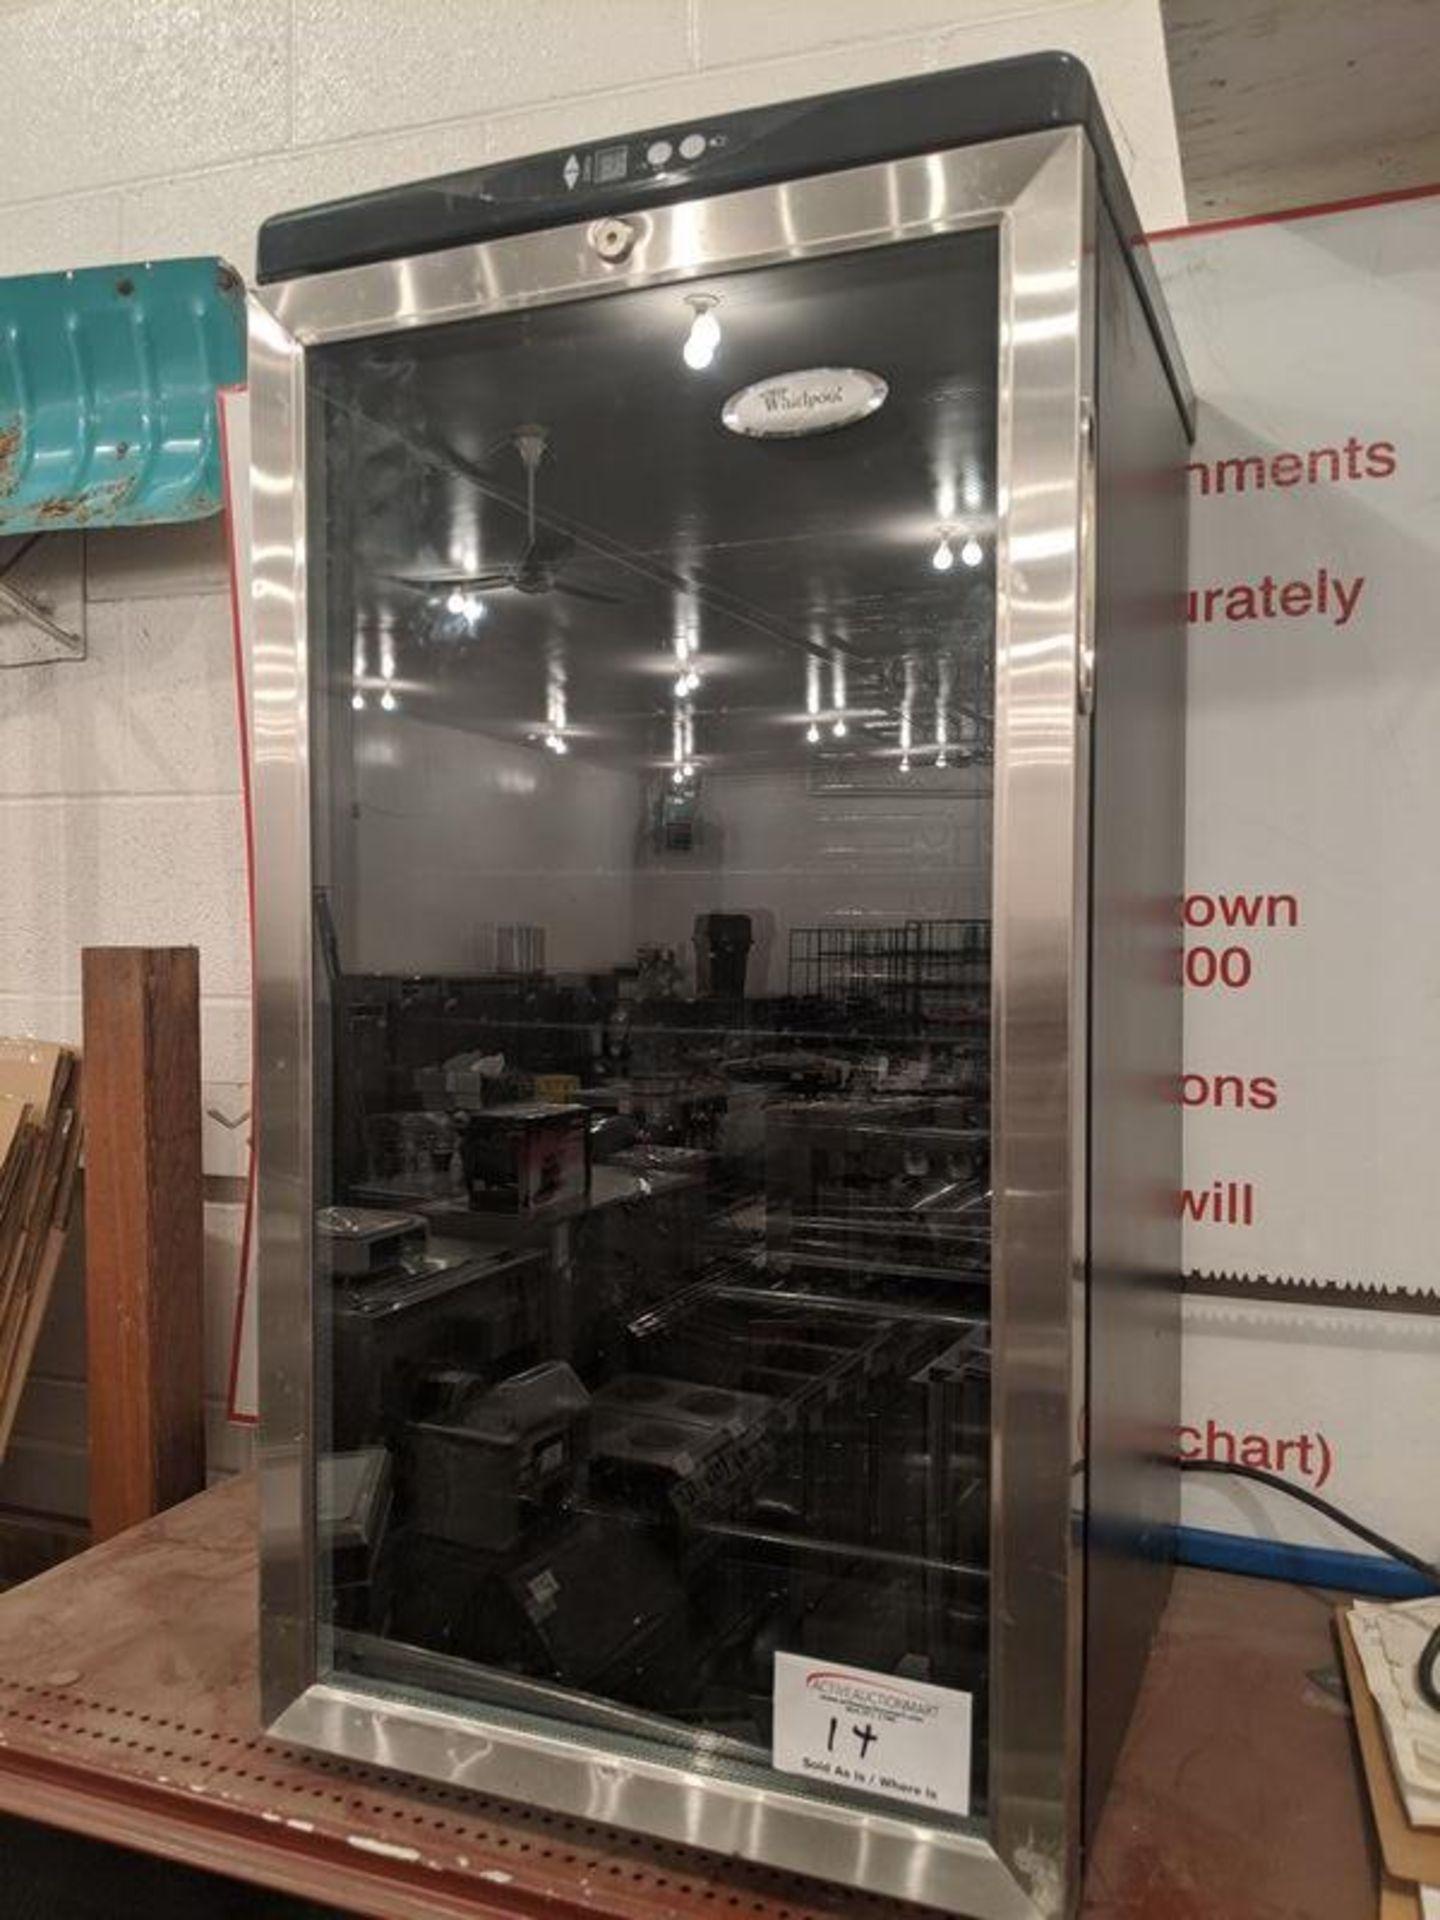 Lot 14 - Whirlpool Bar Fridge with Glass Door